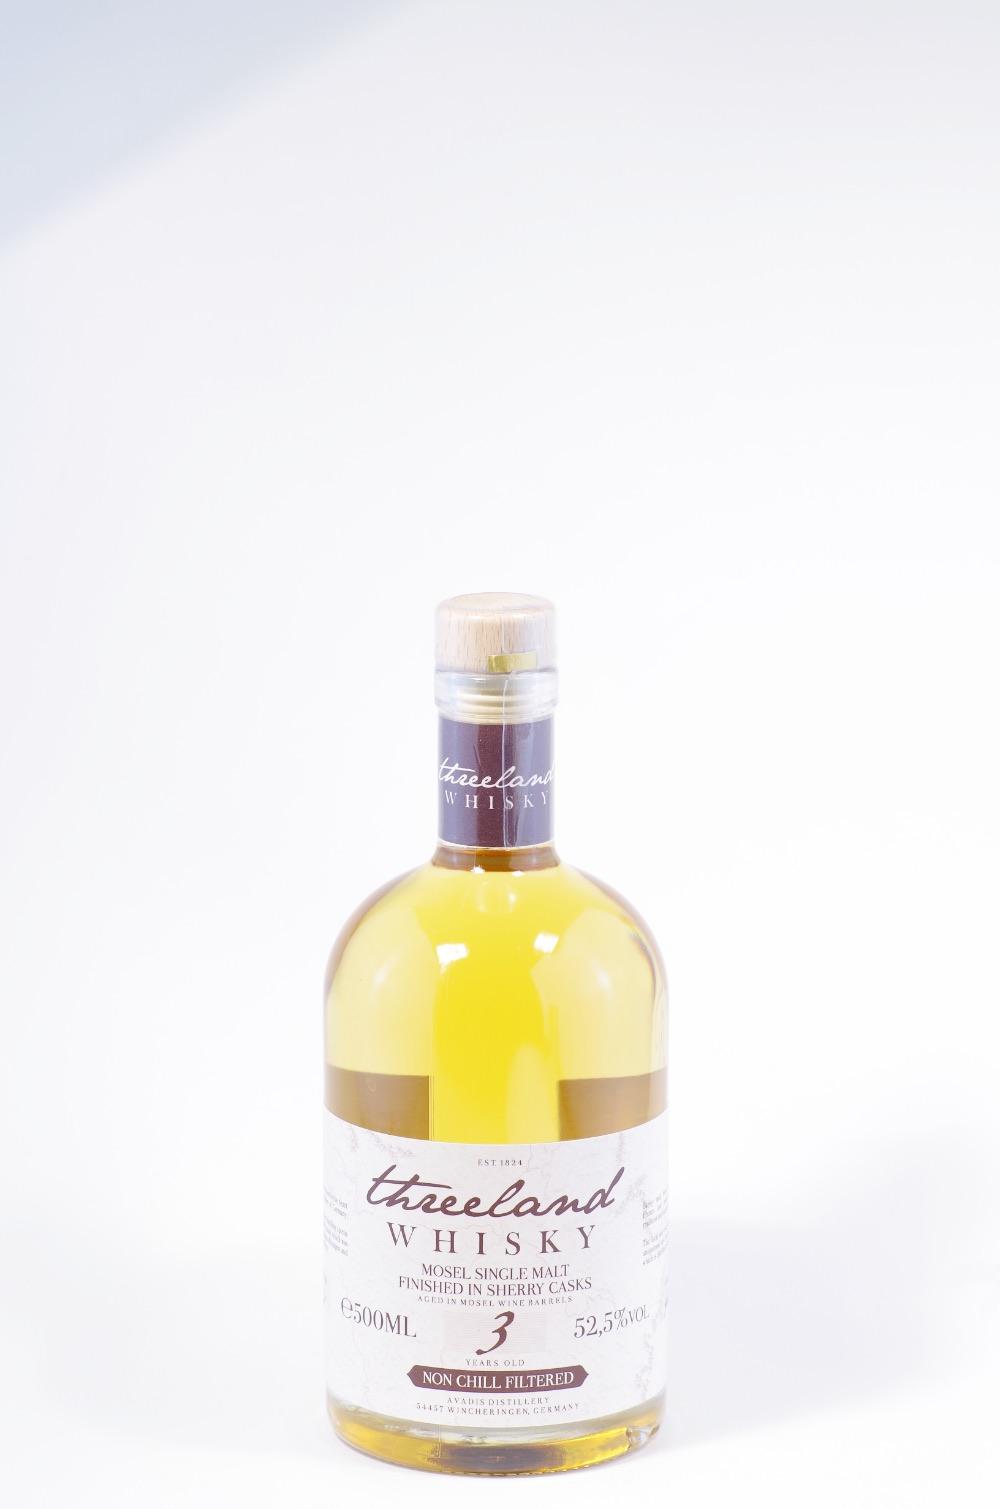 Threeland Whisky sherry Cask Bild